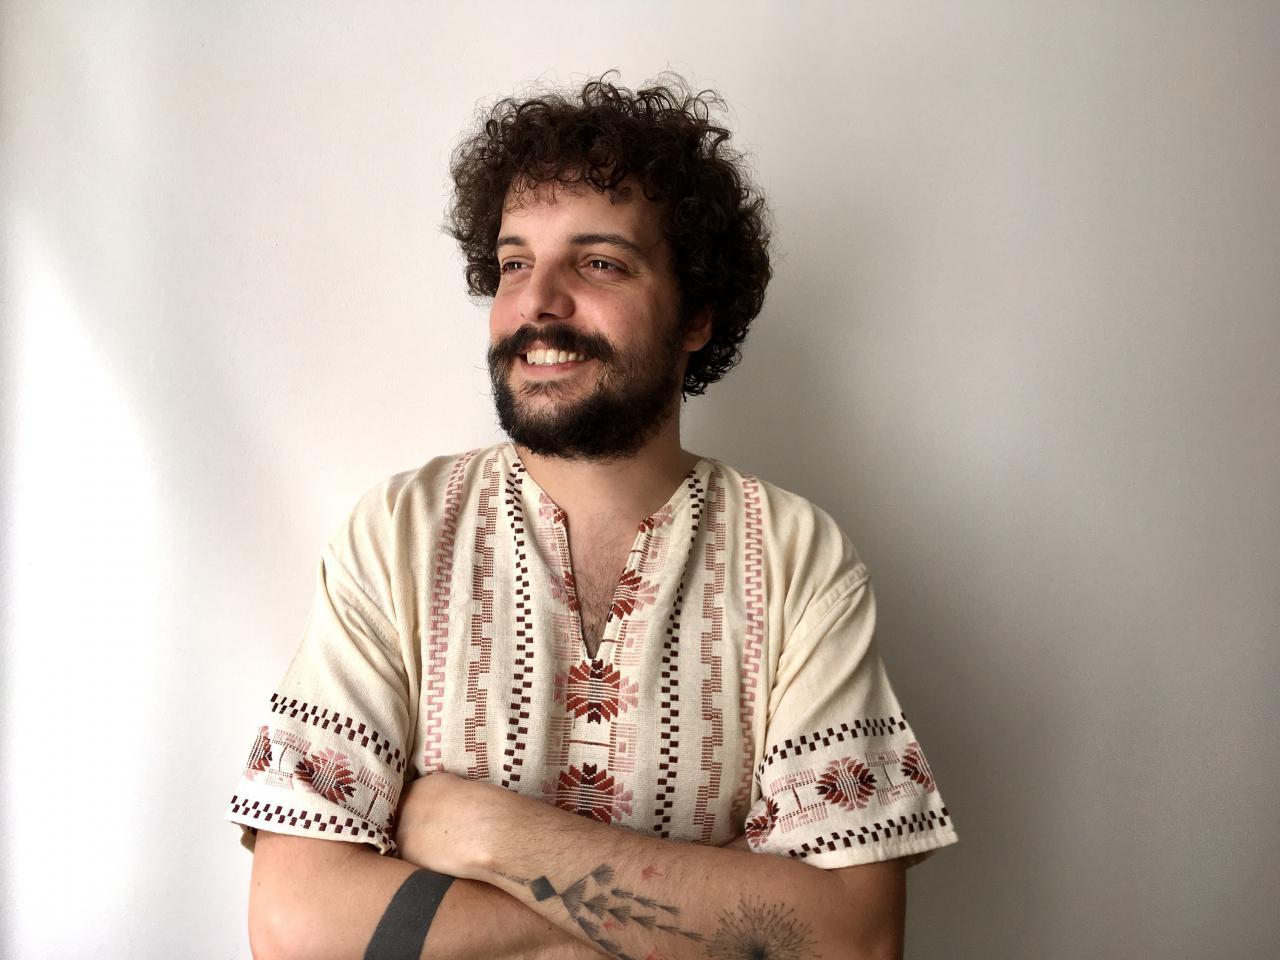 Portrait von Bernardo Fontes